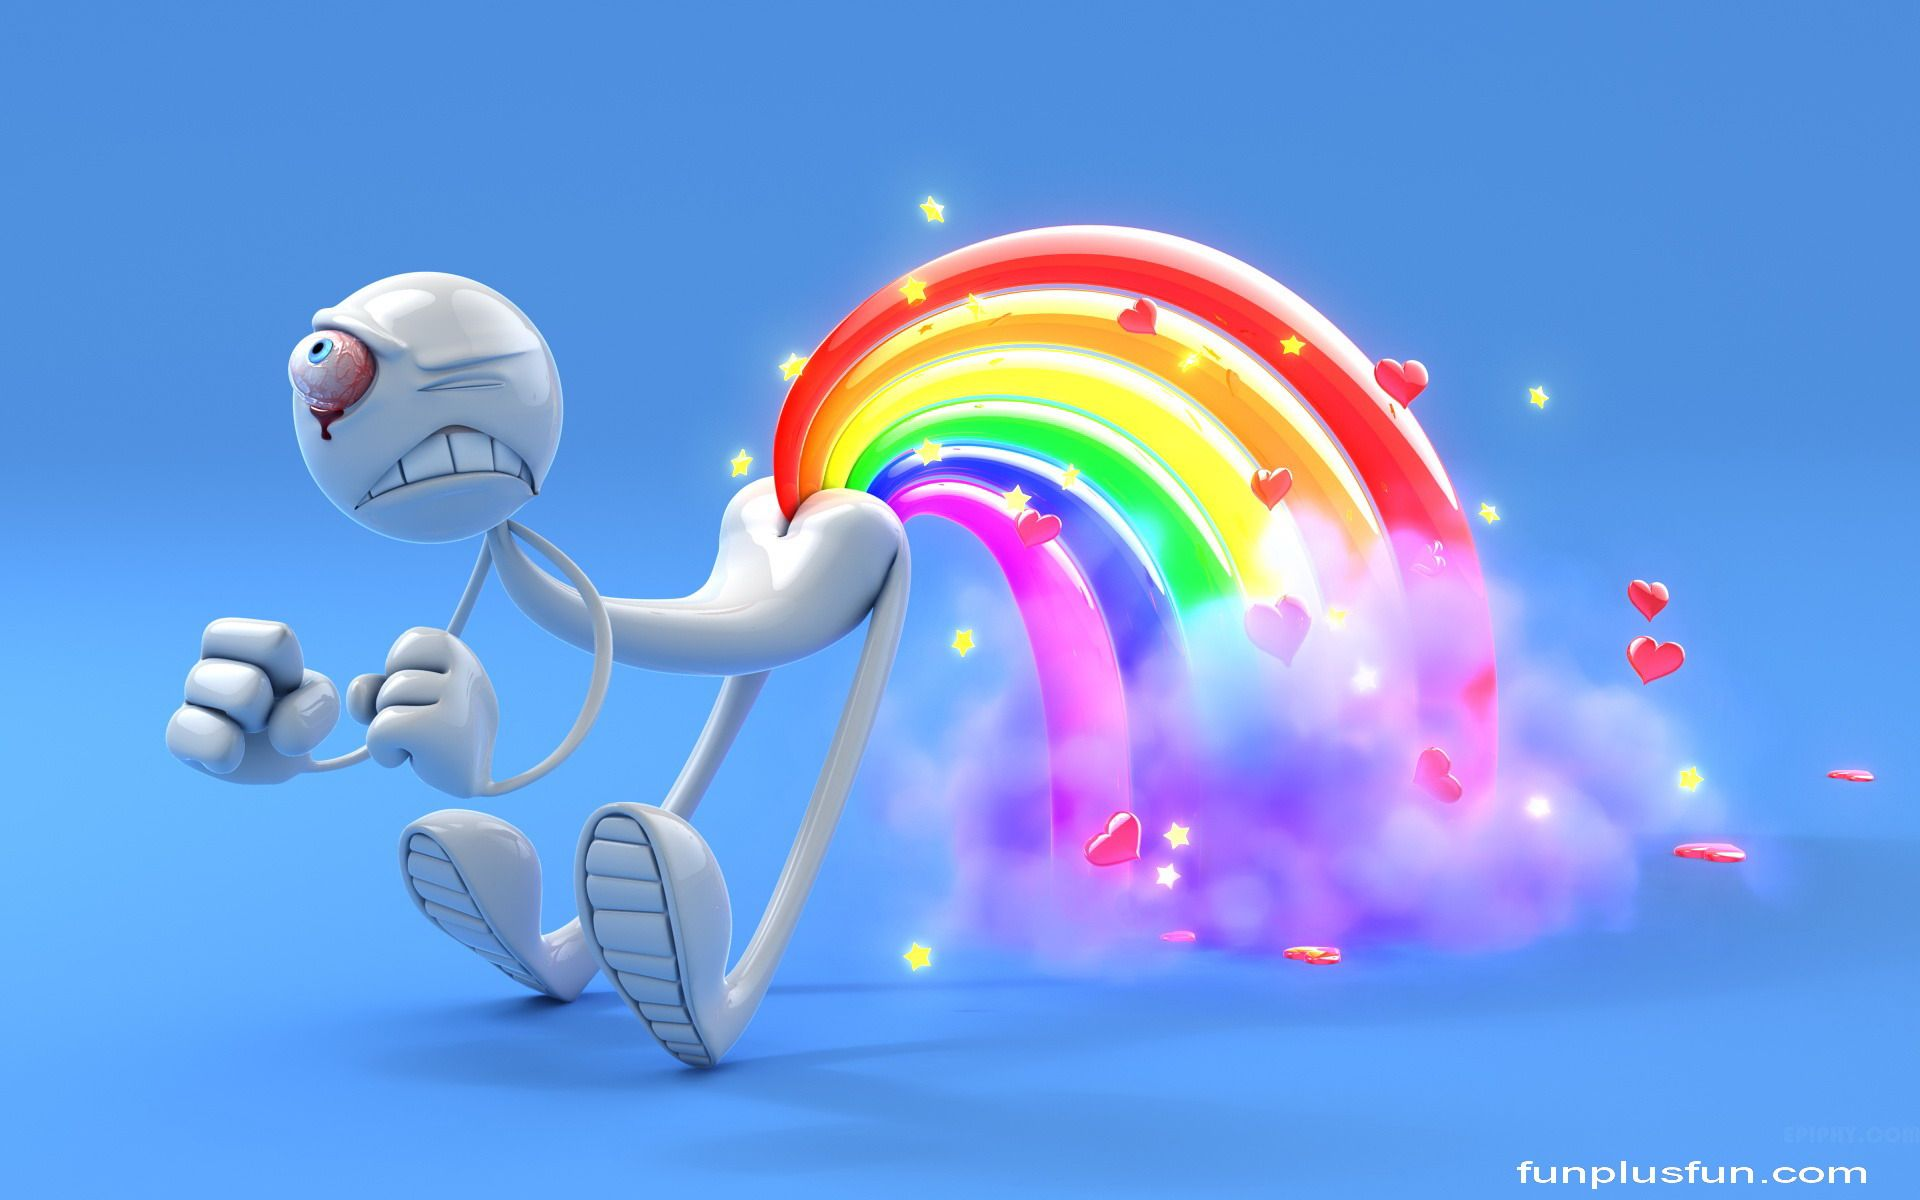 Funny Cartoons Hd Wallpaper For Desktop 21916 R Rainbow